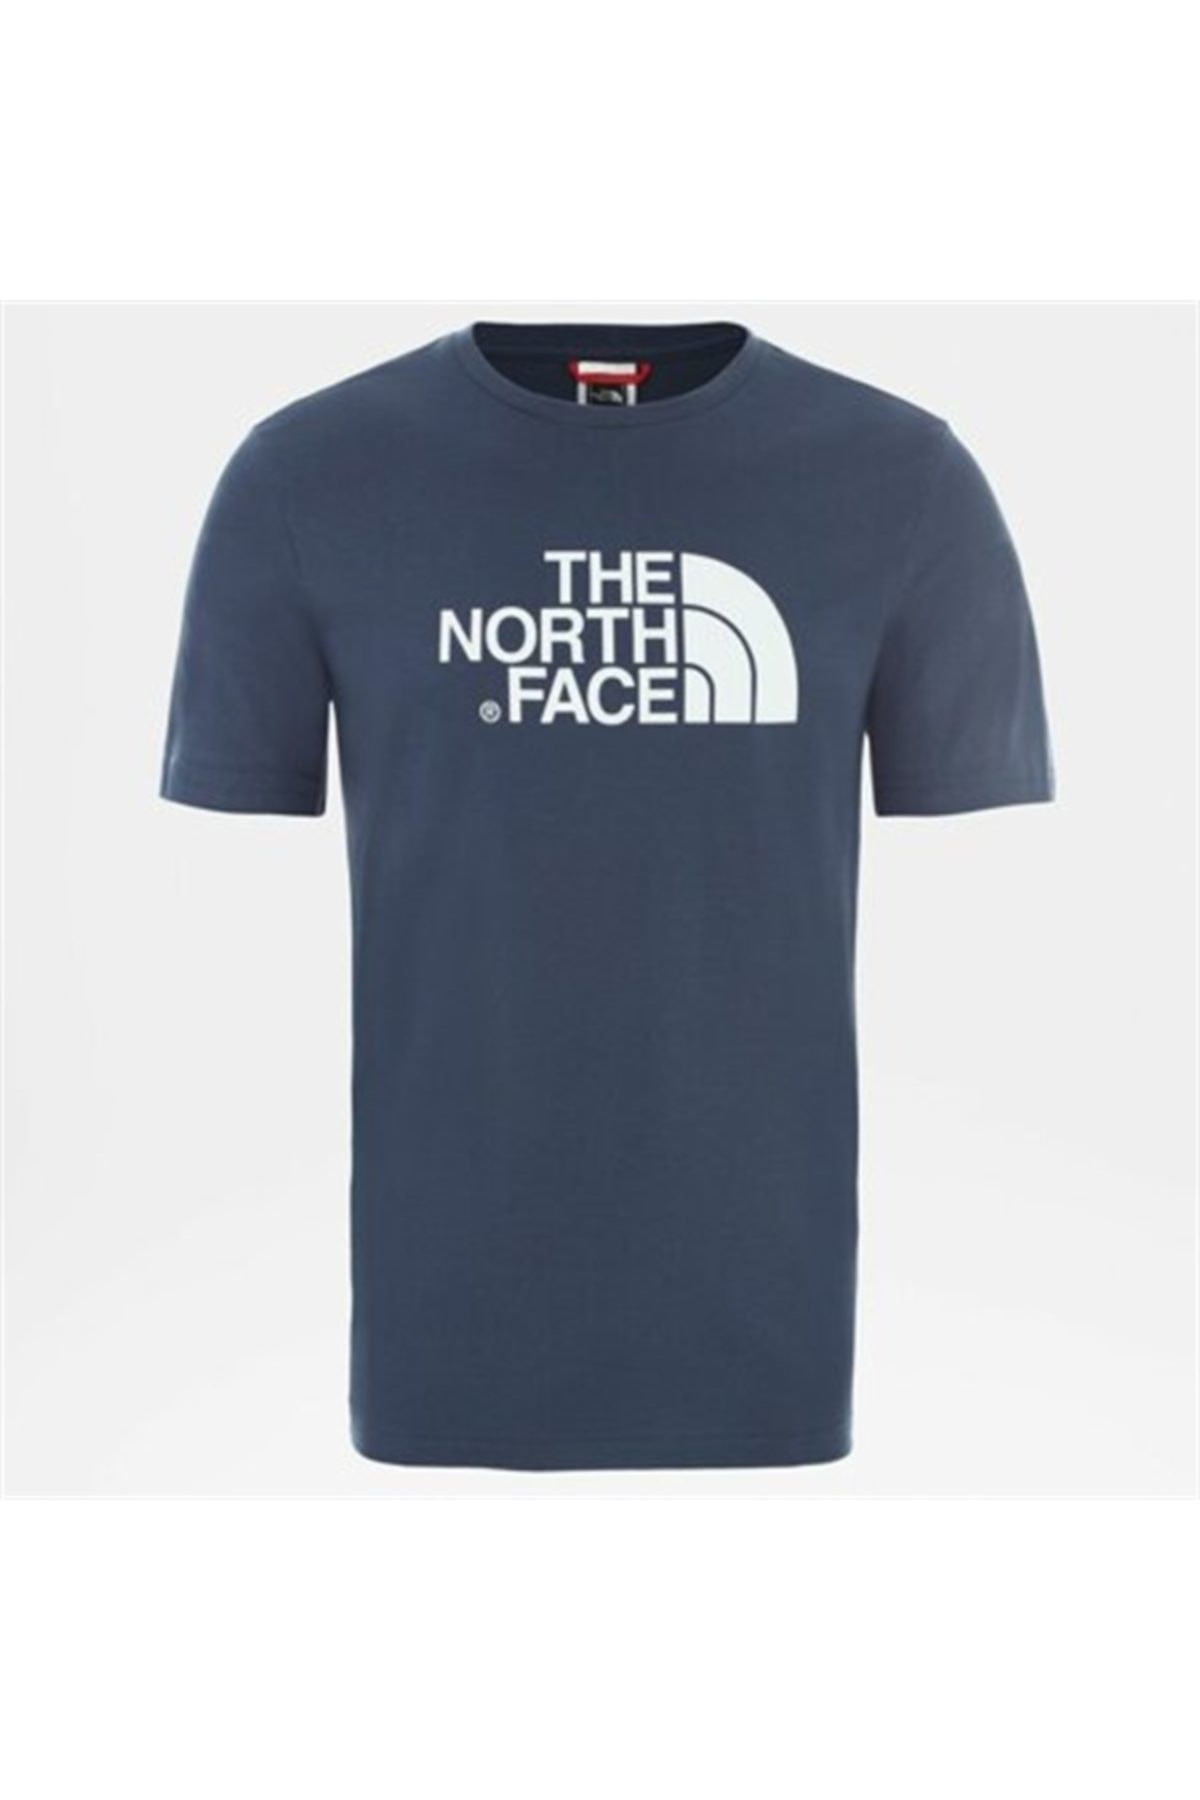 THE NORTH FACE M S/S EASY EU Mavi Erkek T-Shirt 100576713 1